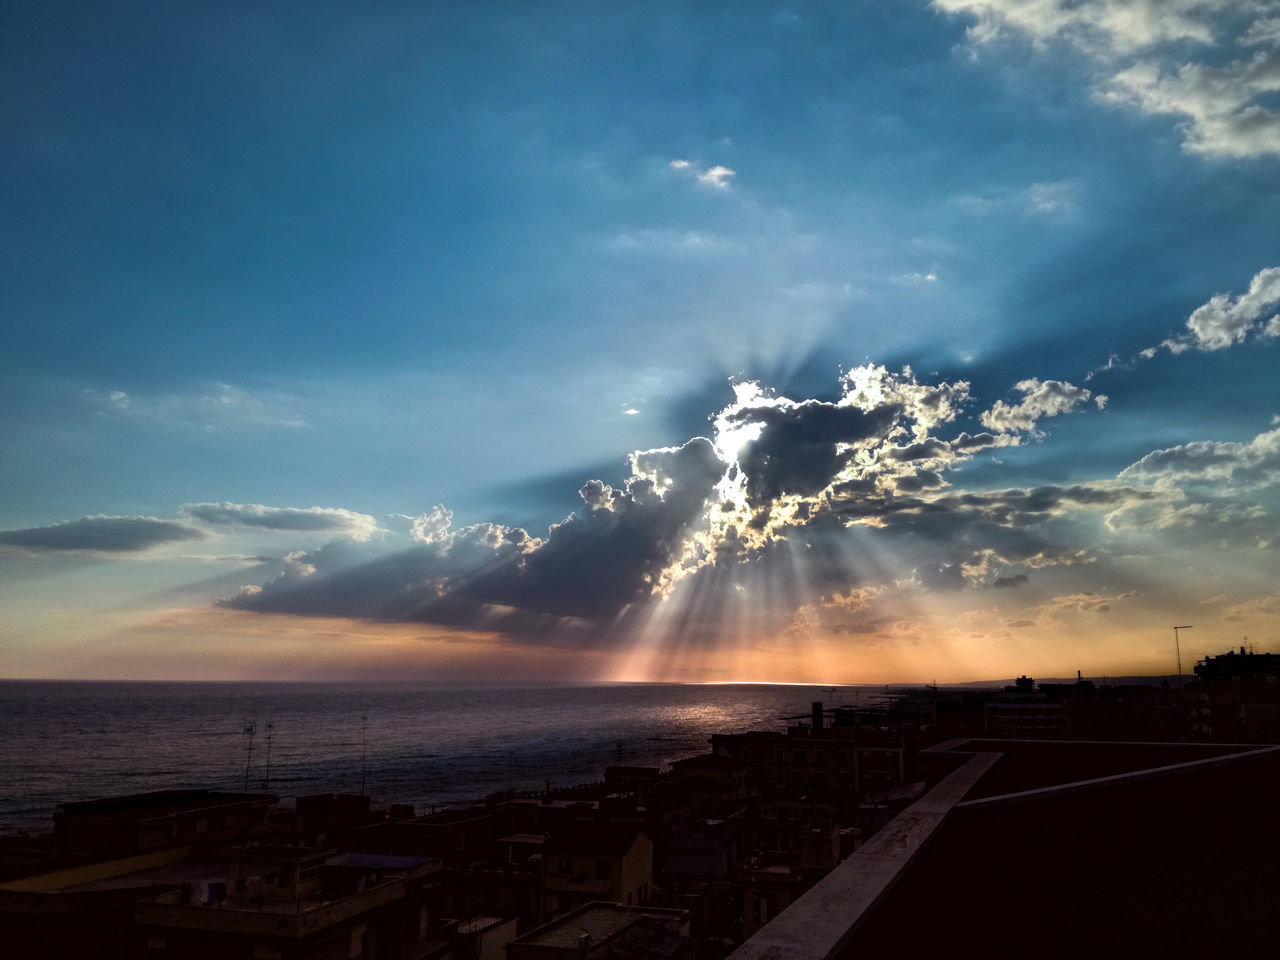 PANORAMIC VIEW OF CITY AT SUNSET